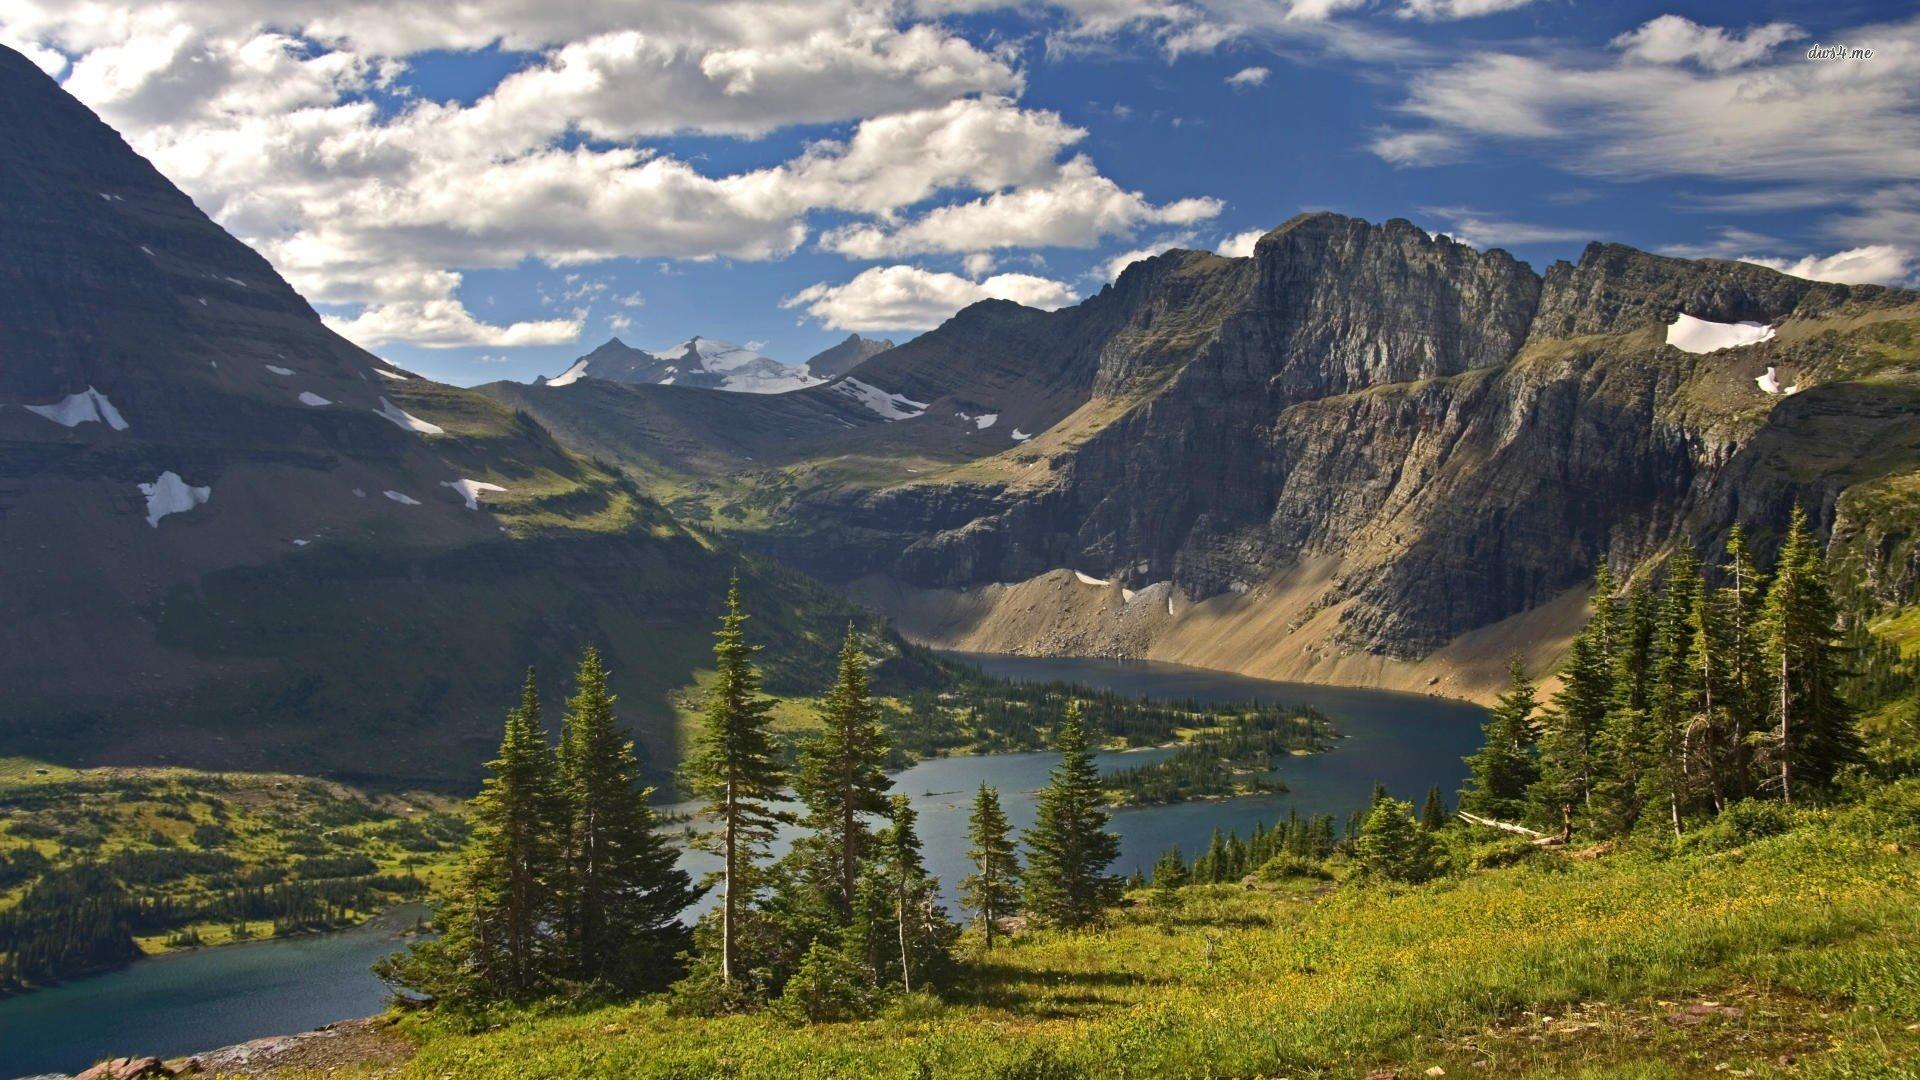 Alsek River Valley, Alaska  № 2454882 бесплатно